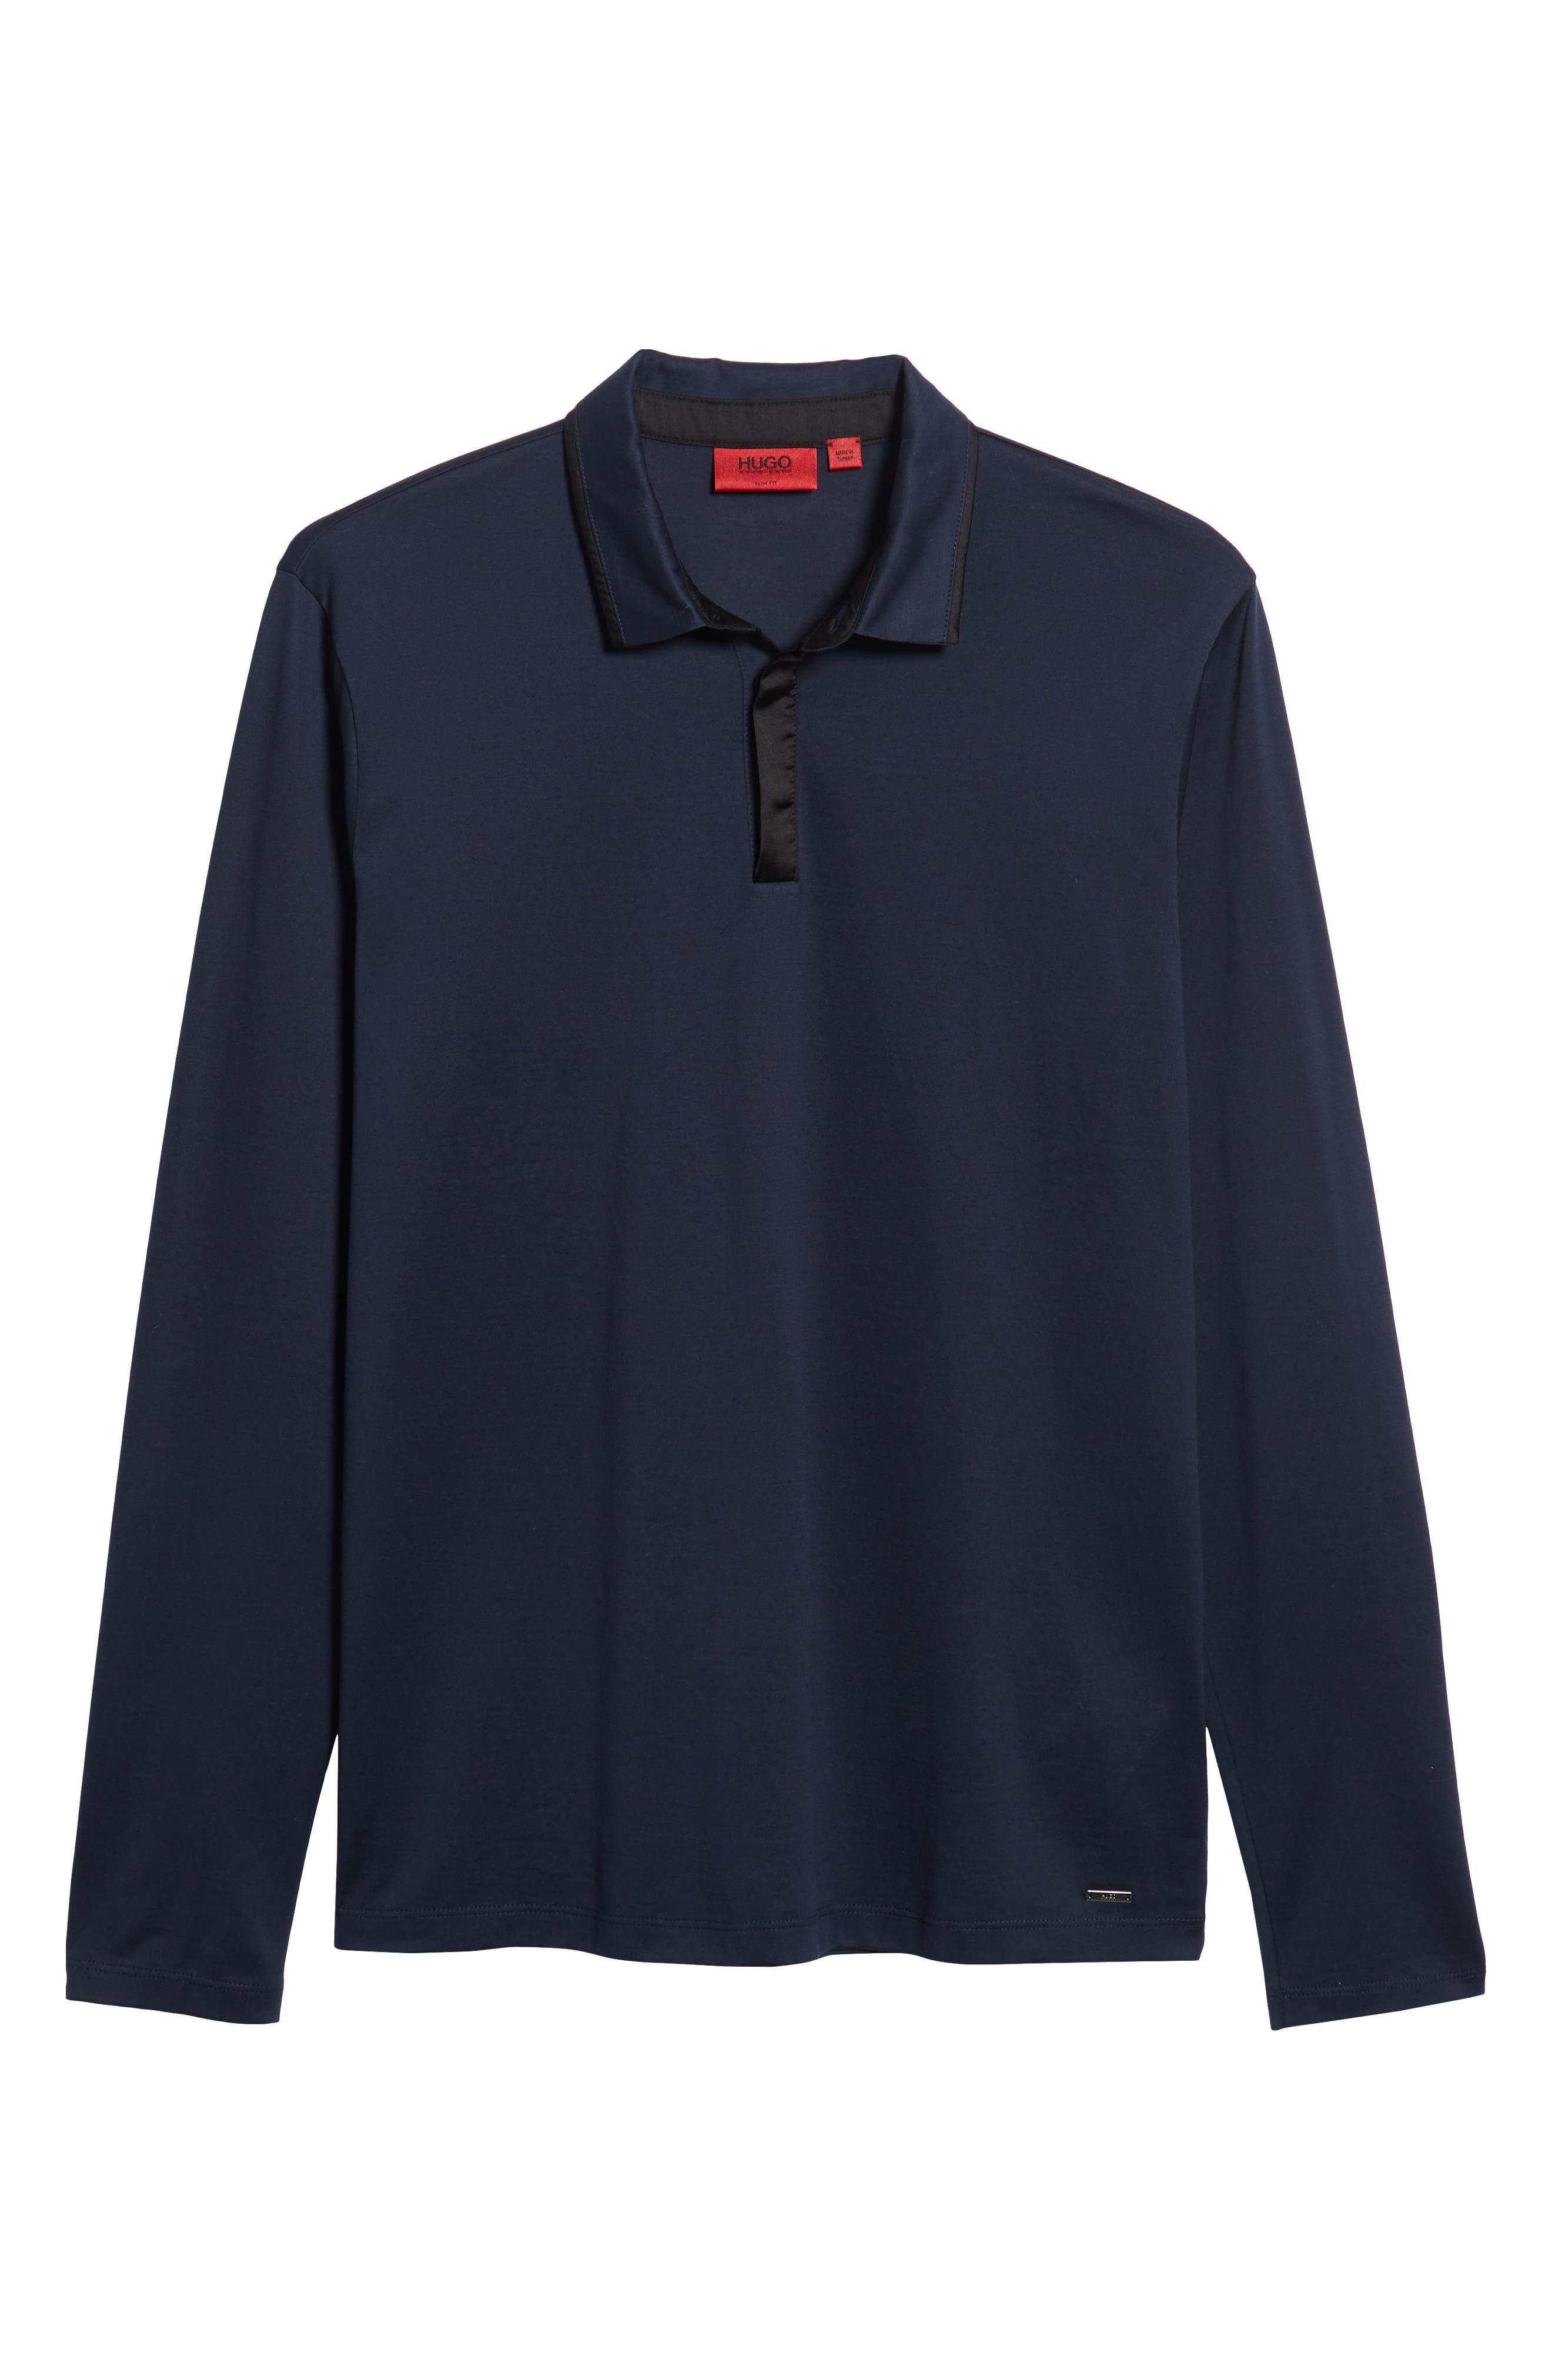 Dalendar Mercerized Cotton Slim Fit Polo Shirt,                             Alternate thumbnail 6, color,                             BLUE